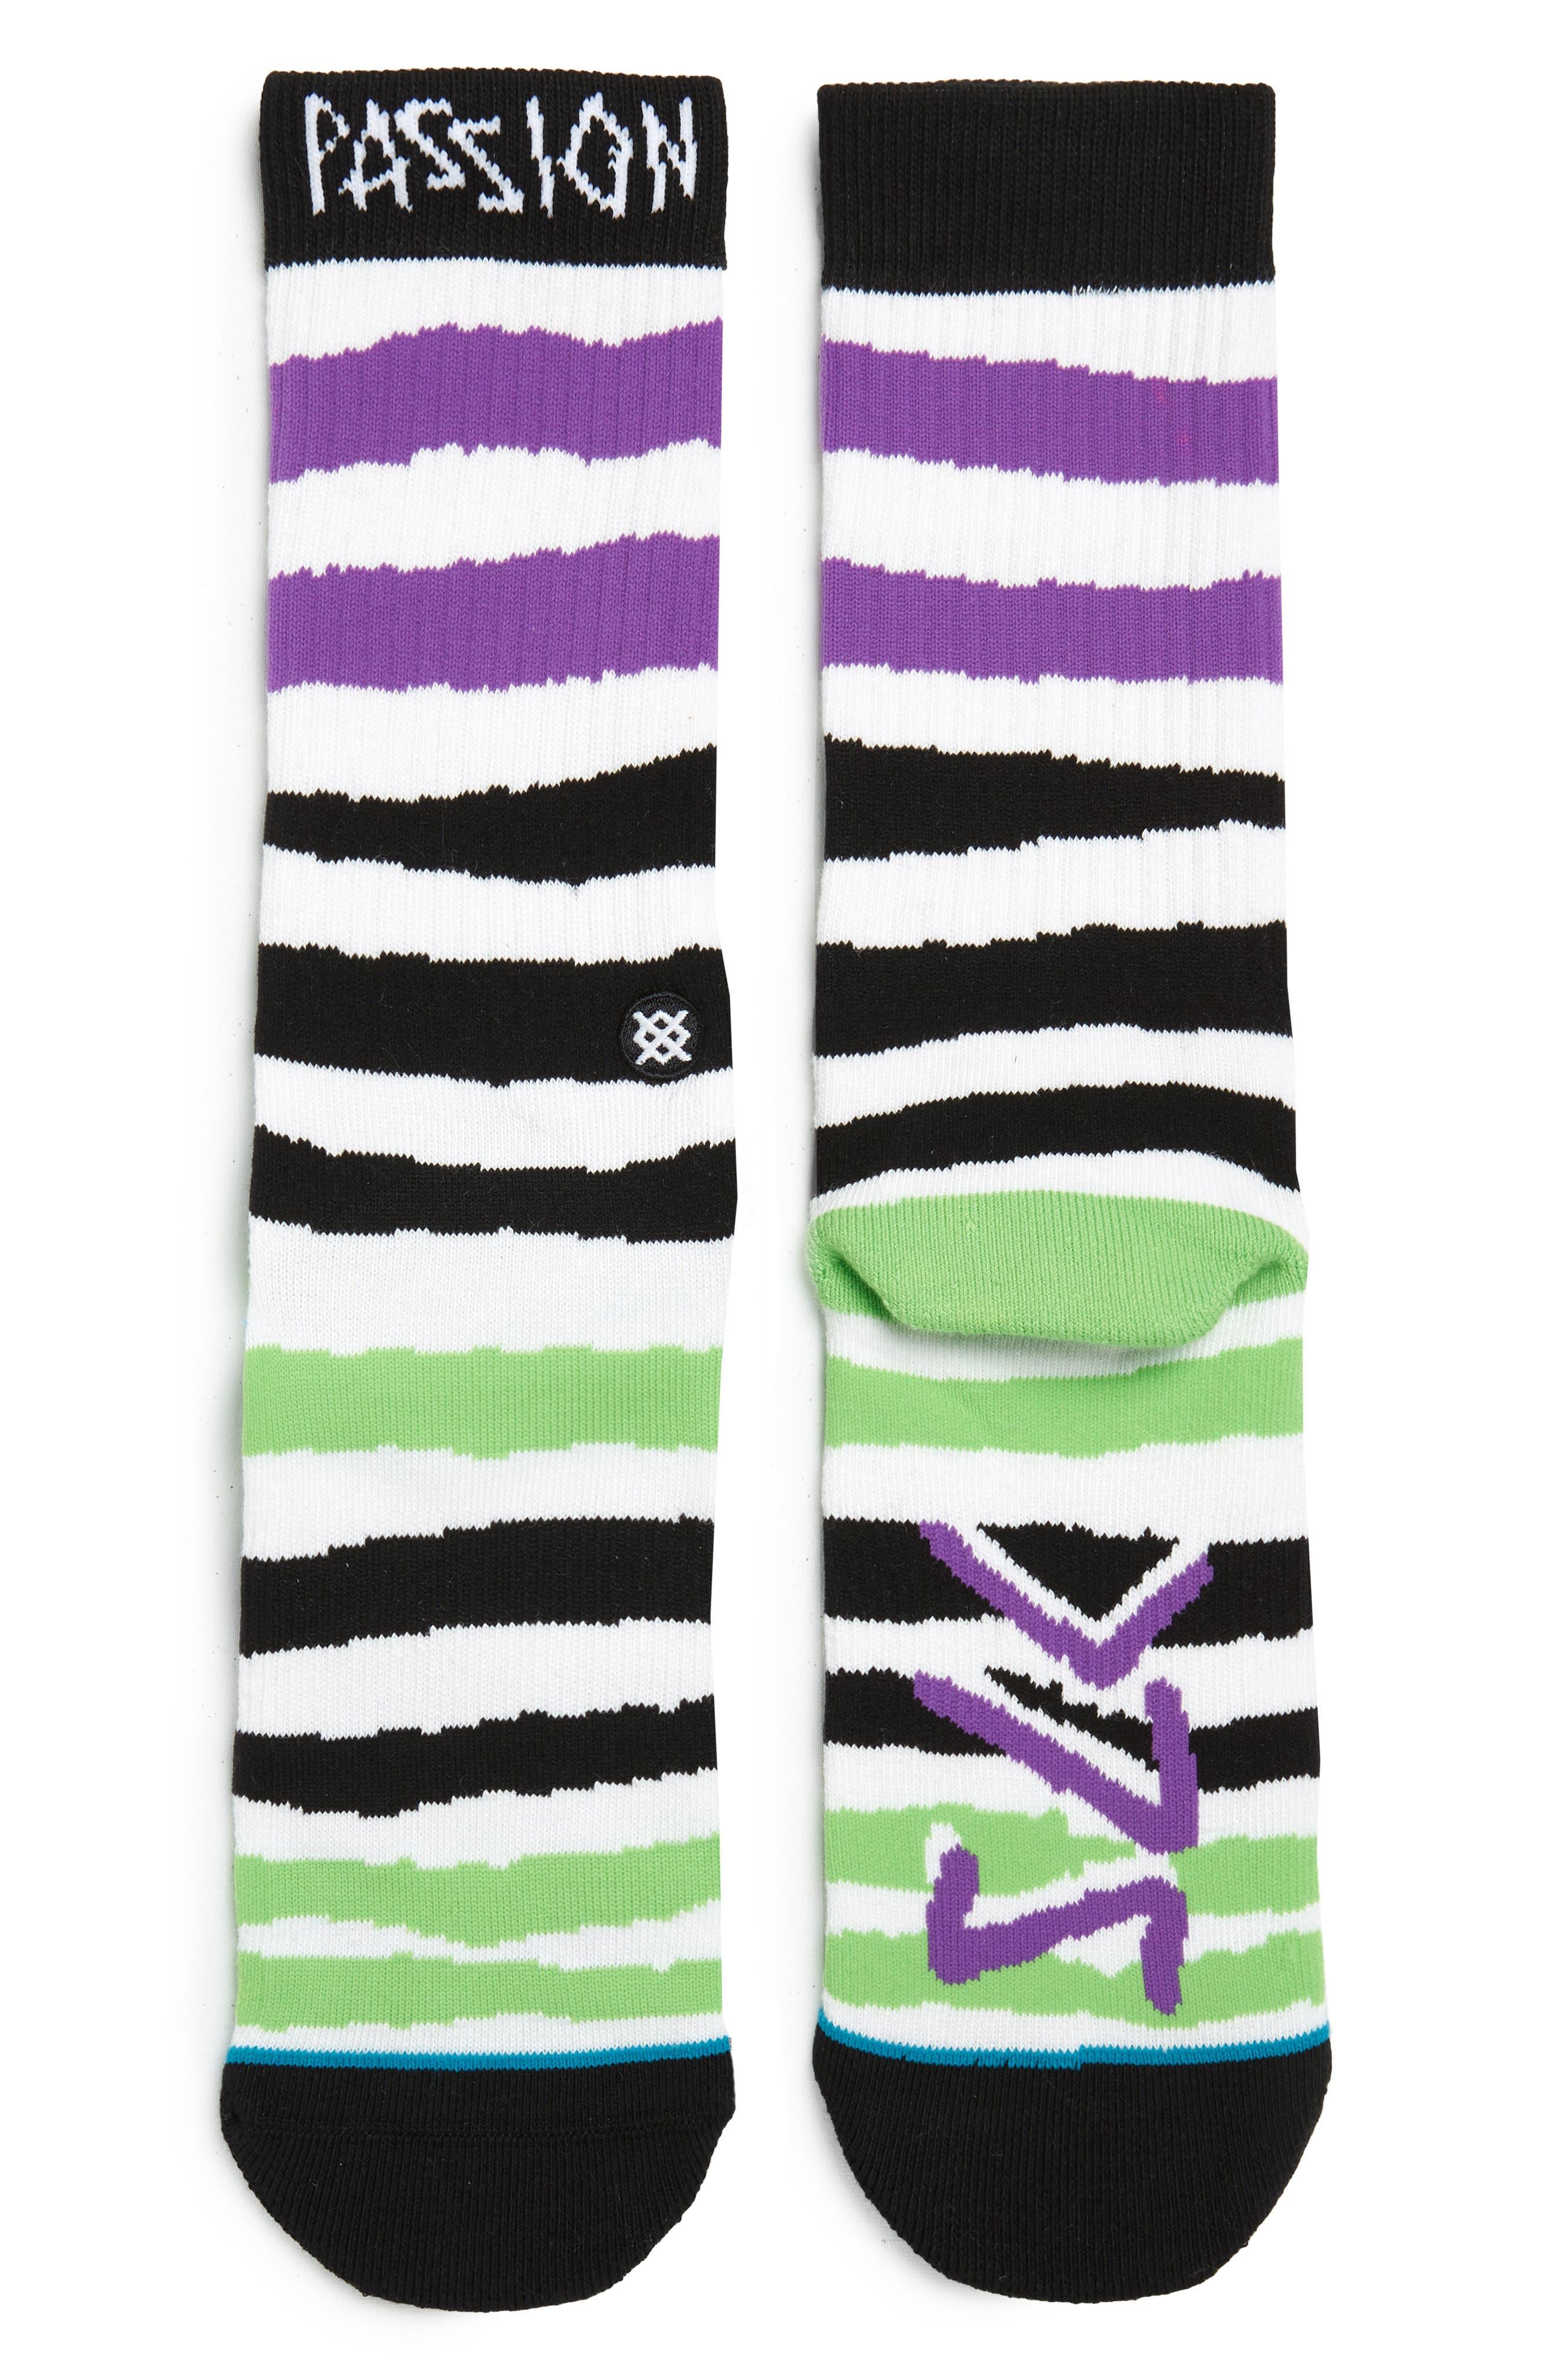 STANCE Passion LK Socks, Main, color, 001